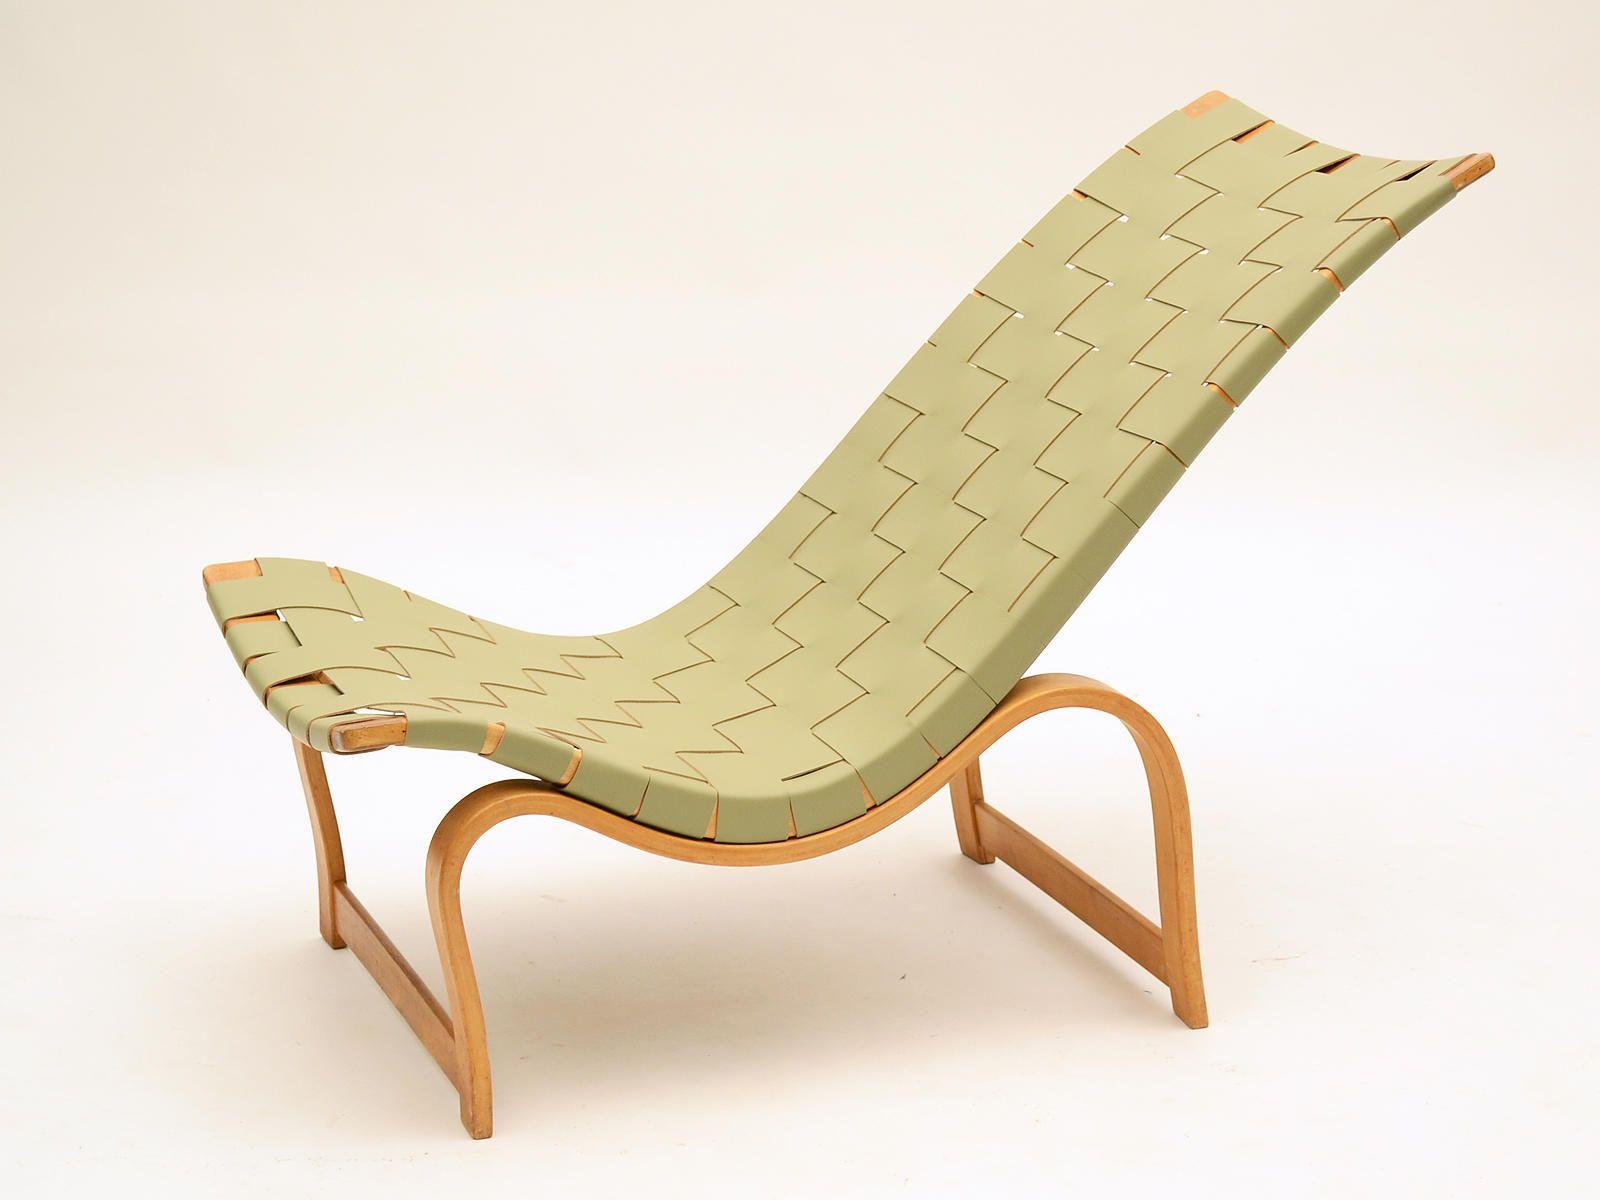 Pegboard Modern Mathsson Model 36 Easy Chair  # Muebles Easy Rosario